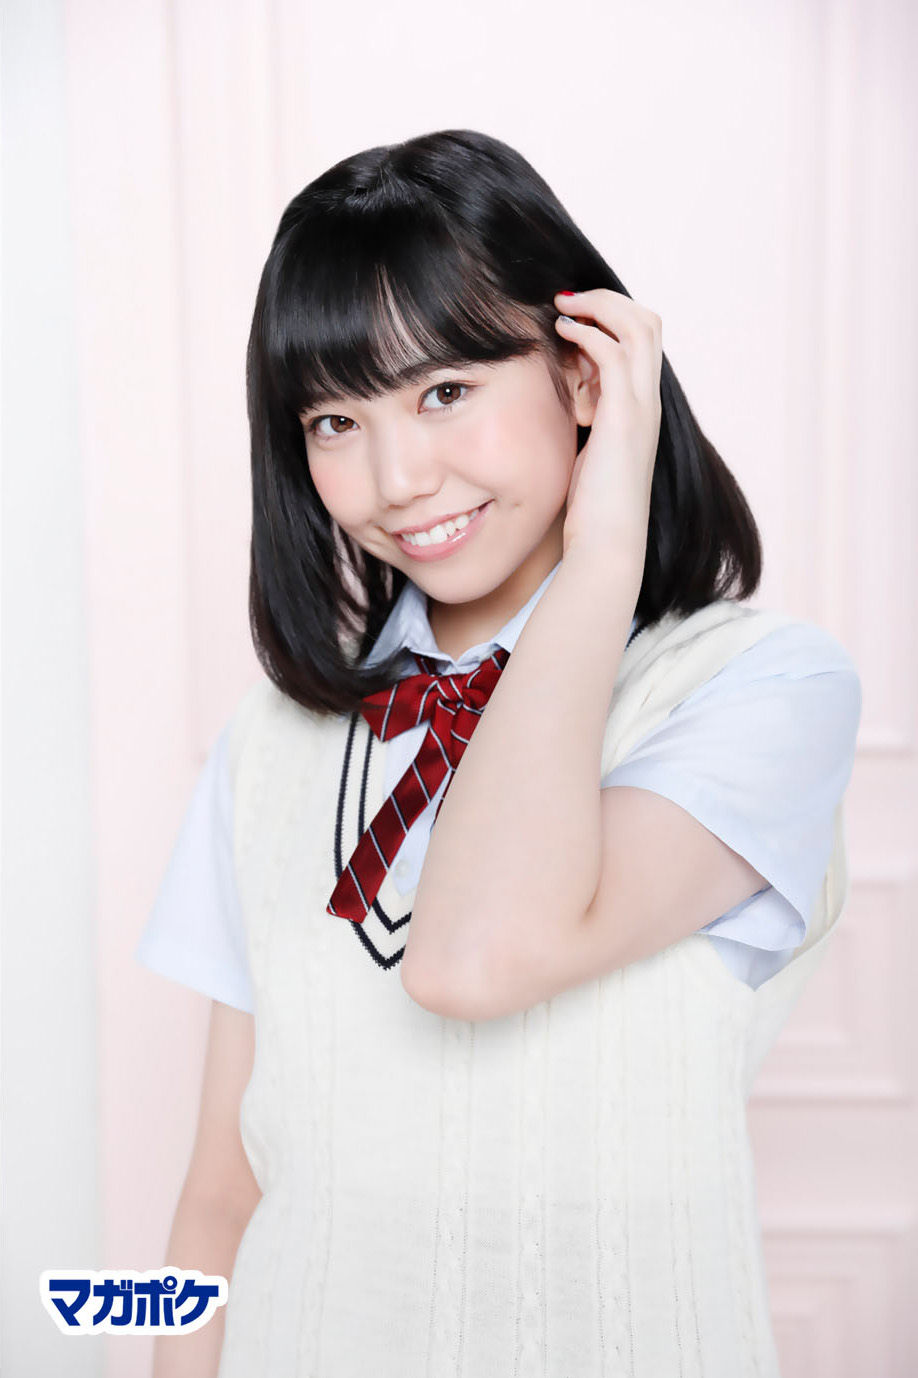 Chou Kurena 長久玲奈, AKB48 Team8 x Weekly Maga Cover Competition